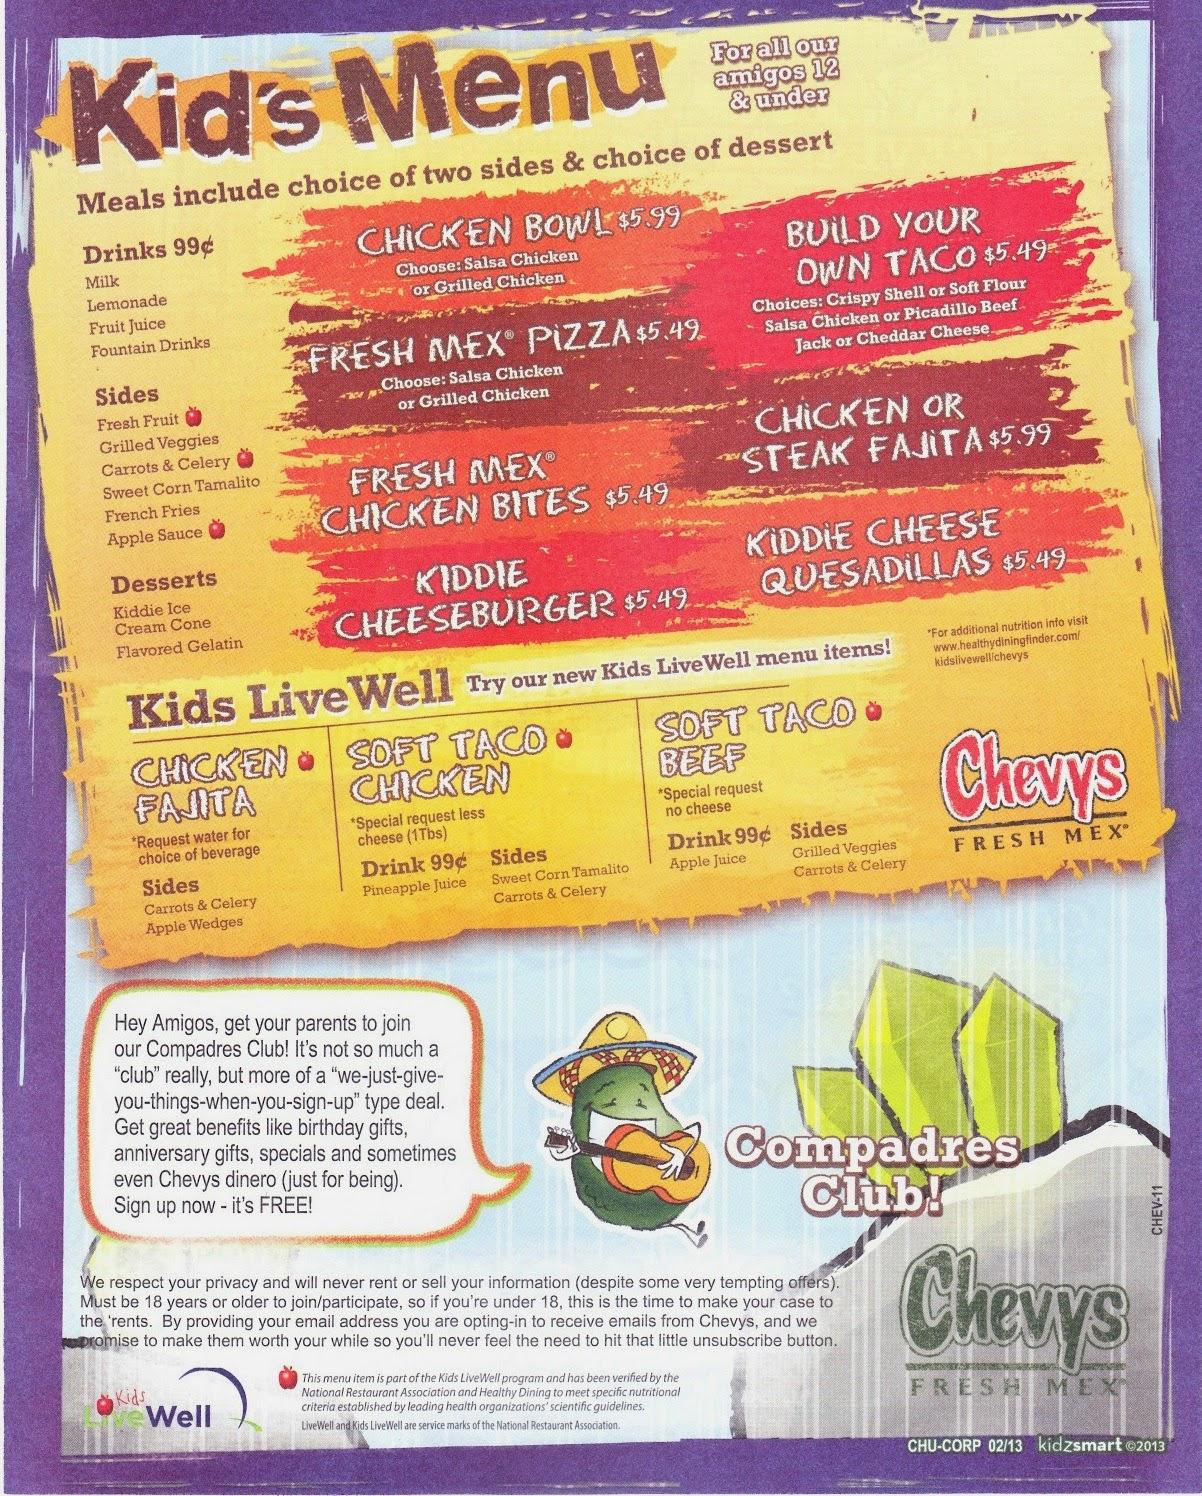 The Kids Menu Chevy S Fresh Mex Kids Menu With Prices